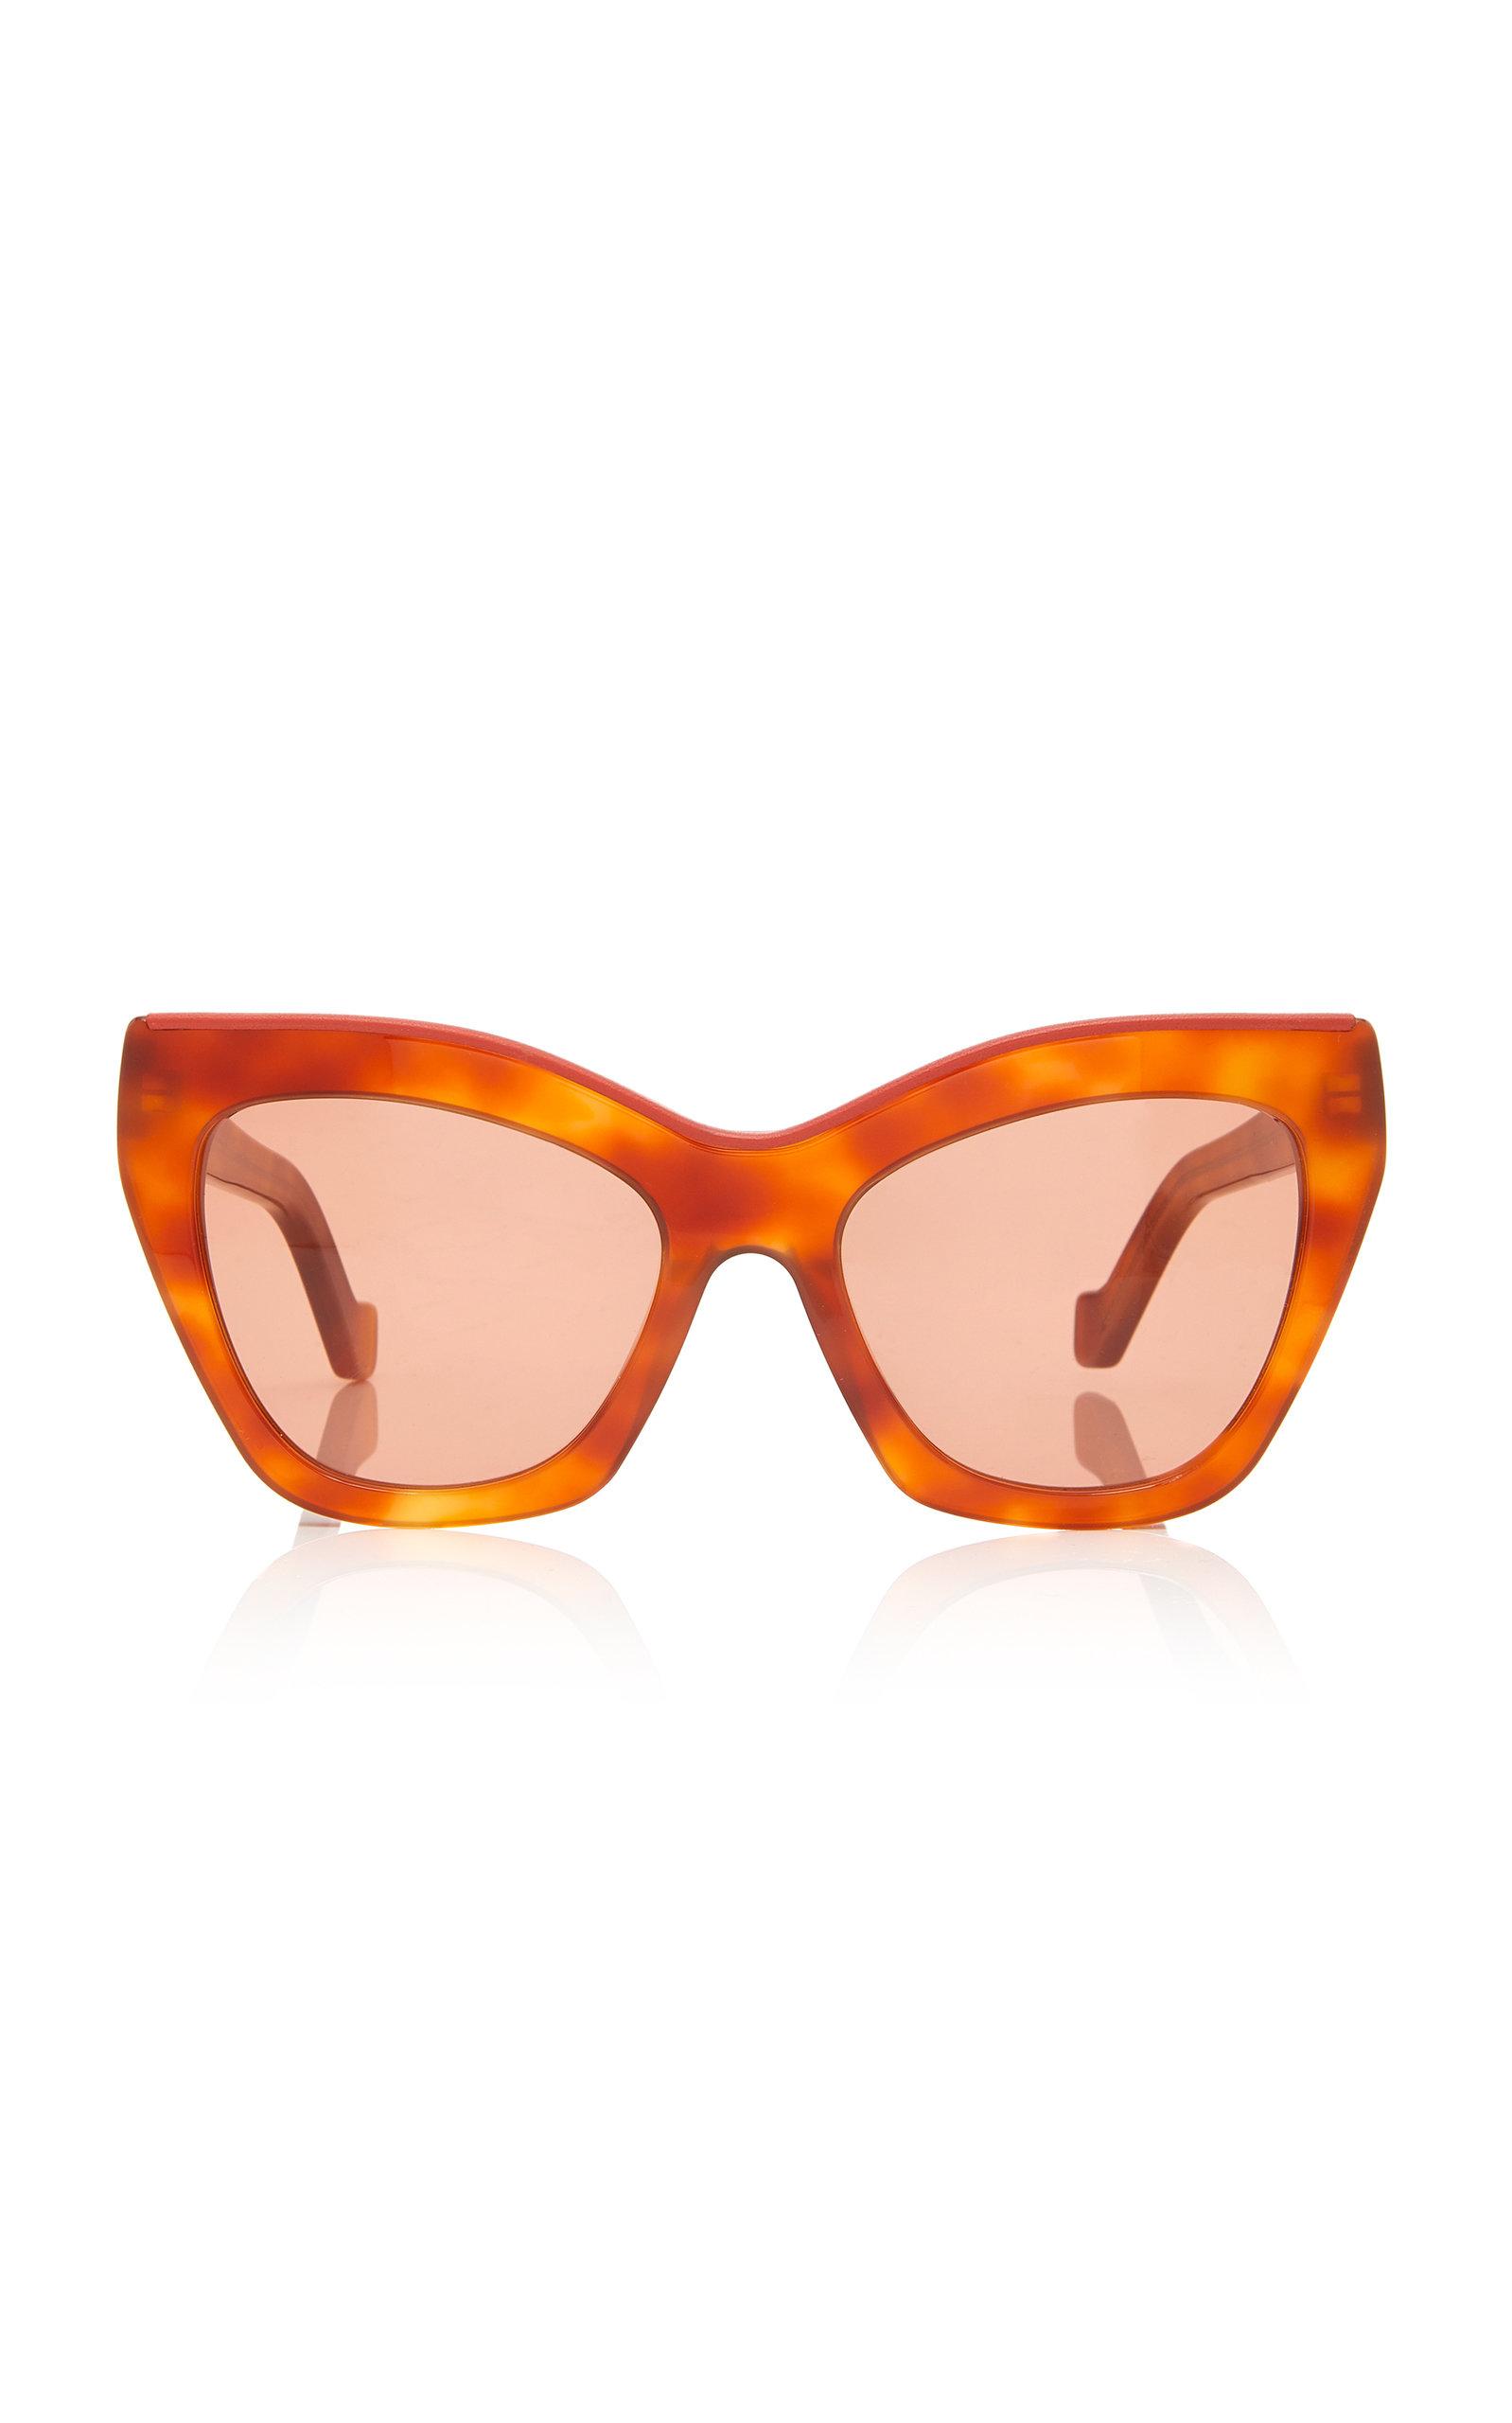 05a25c8df8c Loewe Sunglasses Cat-Eye Acetate Sunglasses